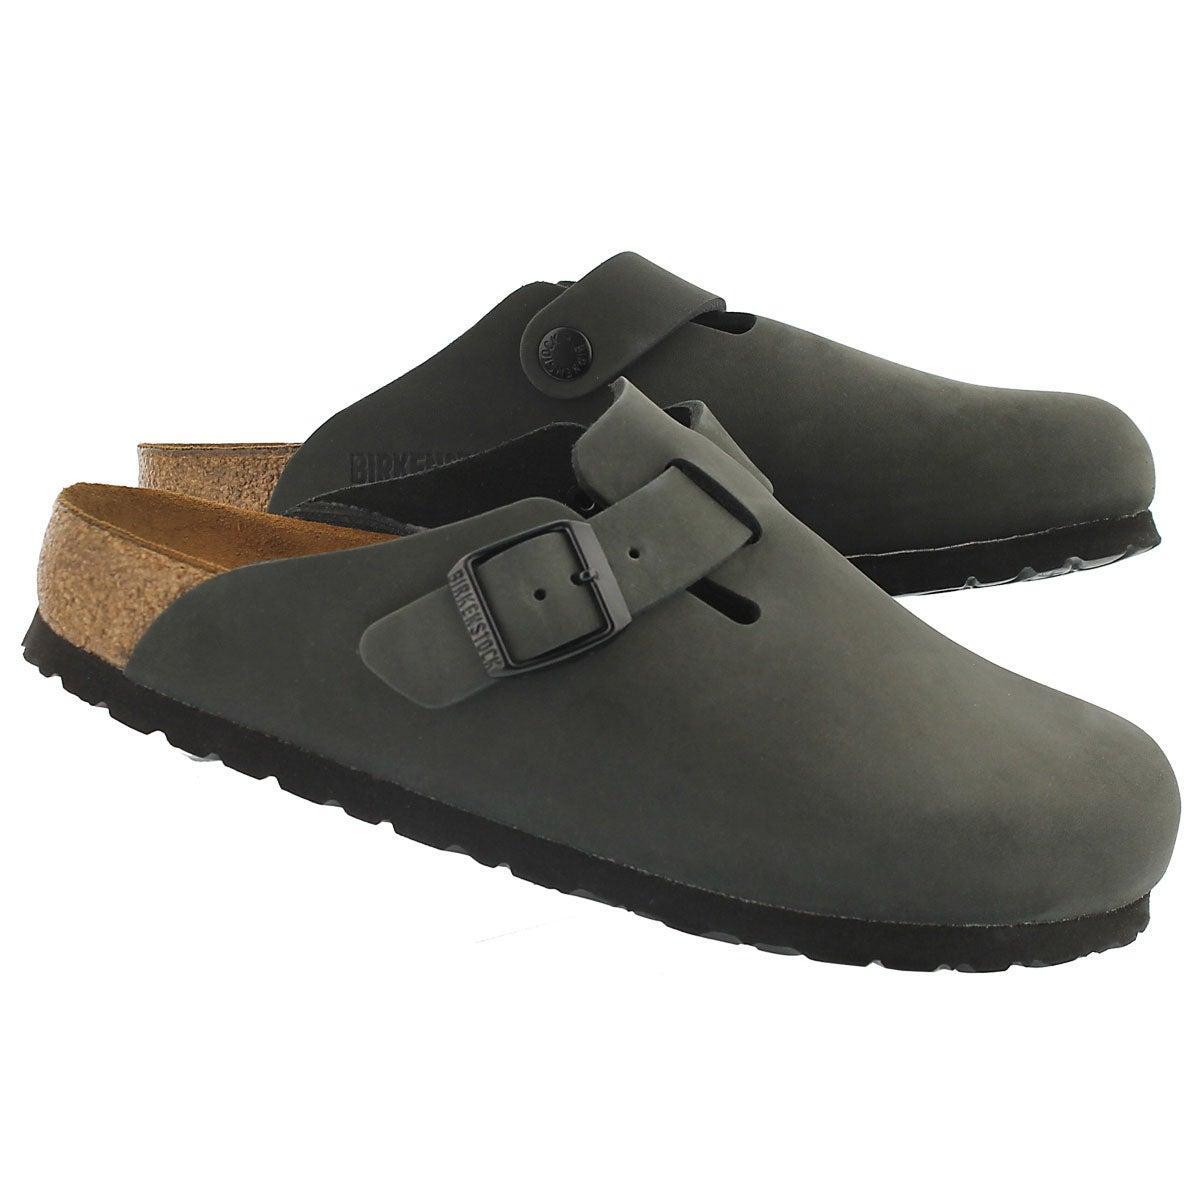 Lds Boston grey leather clog SF